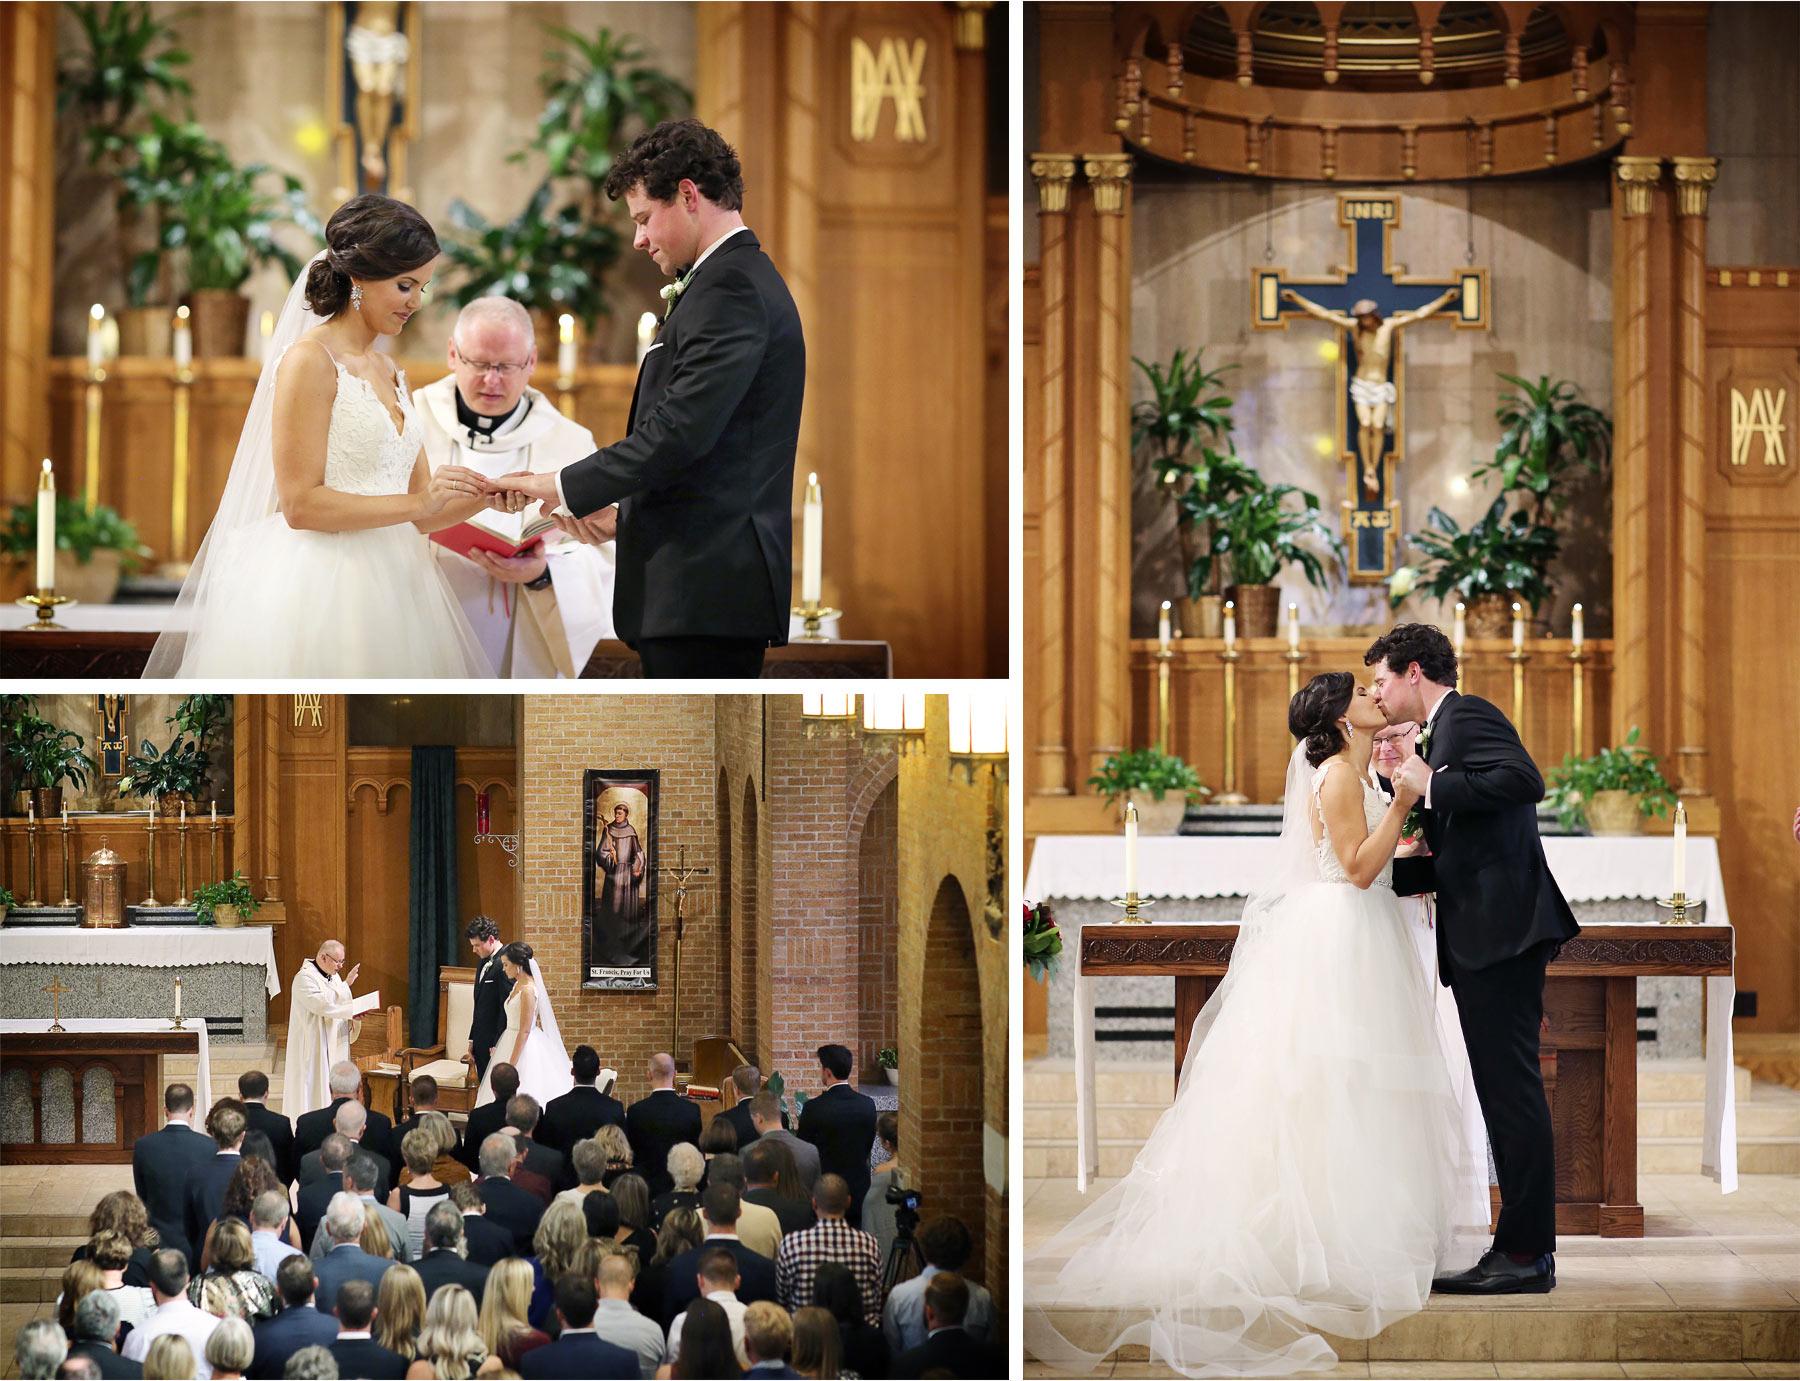 12-Brainerd-Minnesota-Wedding-Photography-by-Vick-Photography-St.-Francis-Catholic-Church-Ceremony-Bethany-and-Anthony.jpg